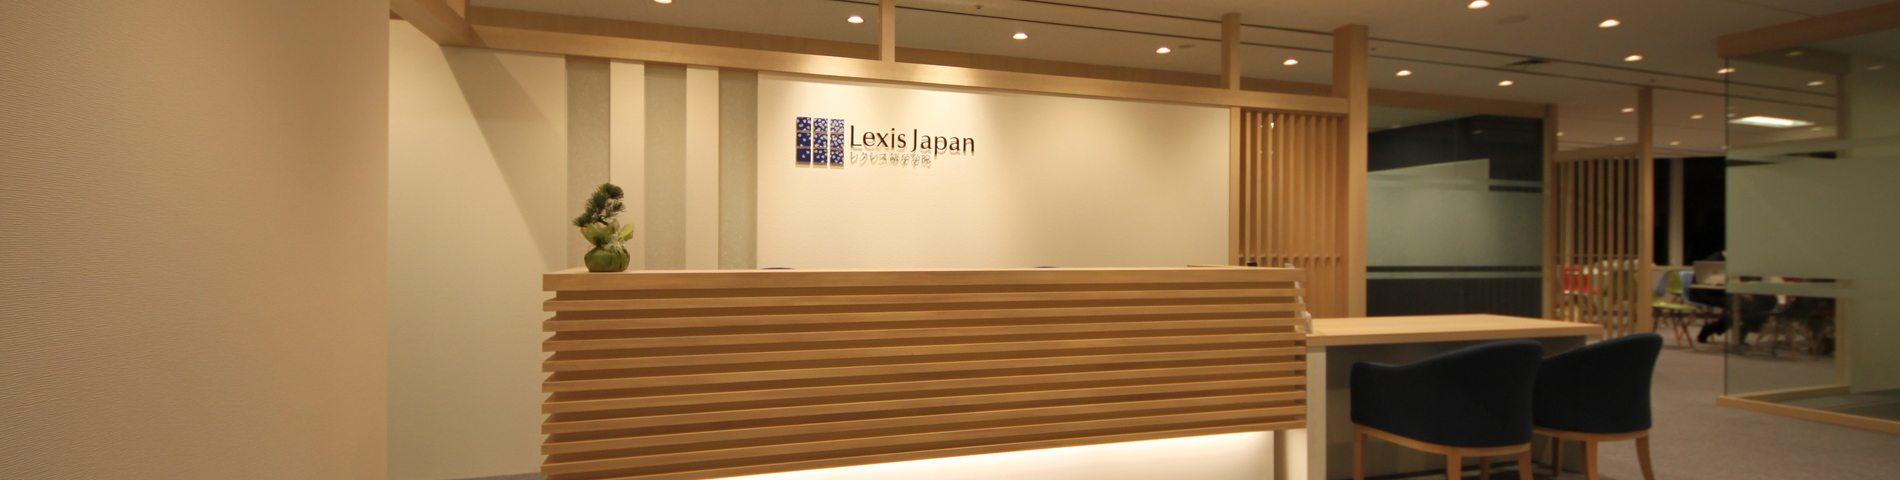 Lexis Japan صورة 1